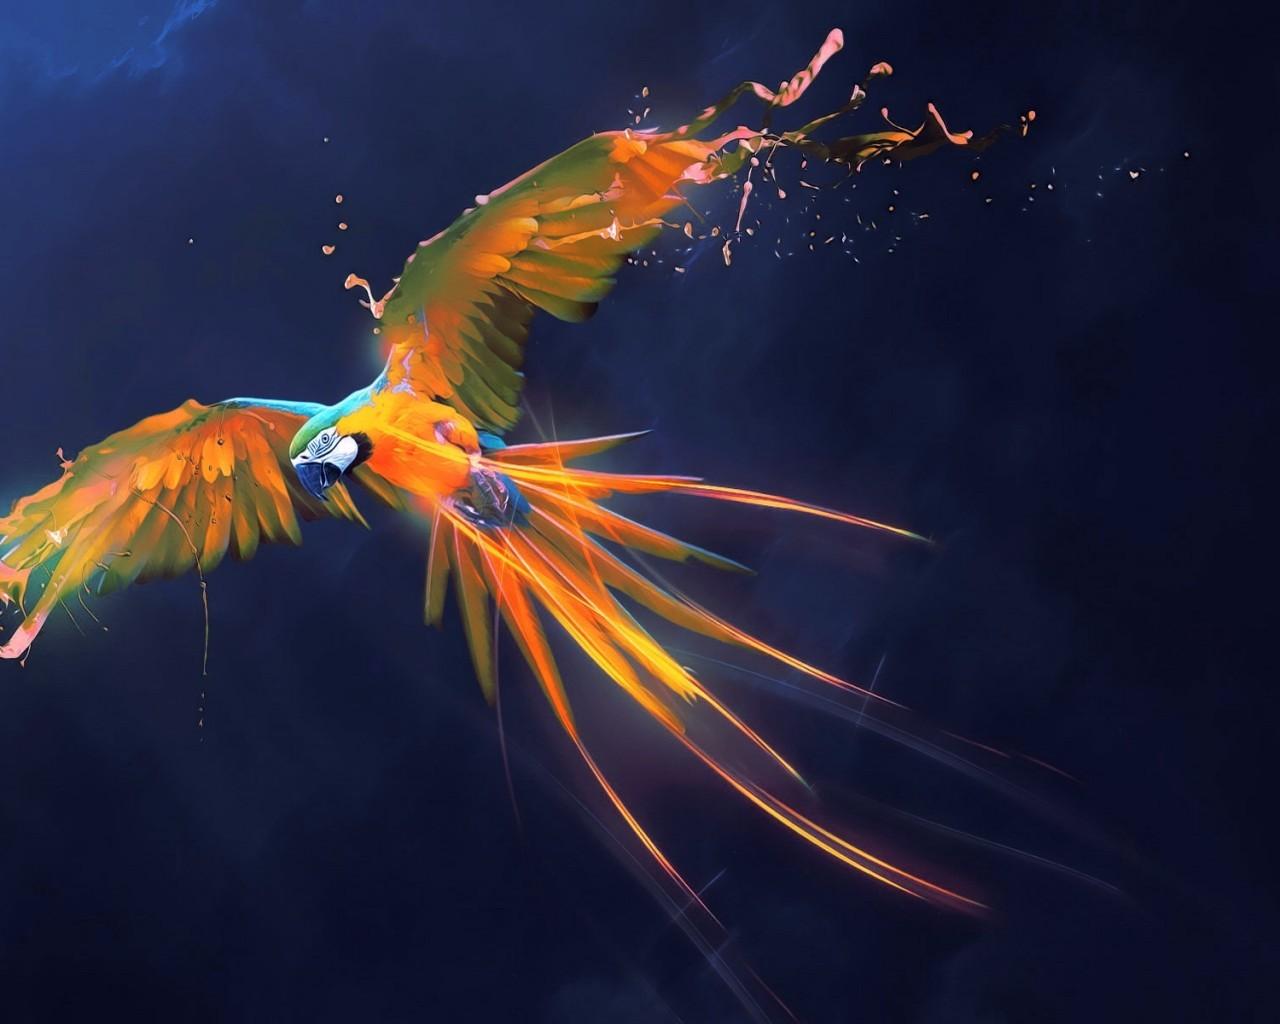 Parrot, Digital Art, Feathers, Flying, Birds - Flying Digital Art Bird , HD Wallpaper & Backgrounds